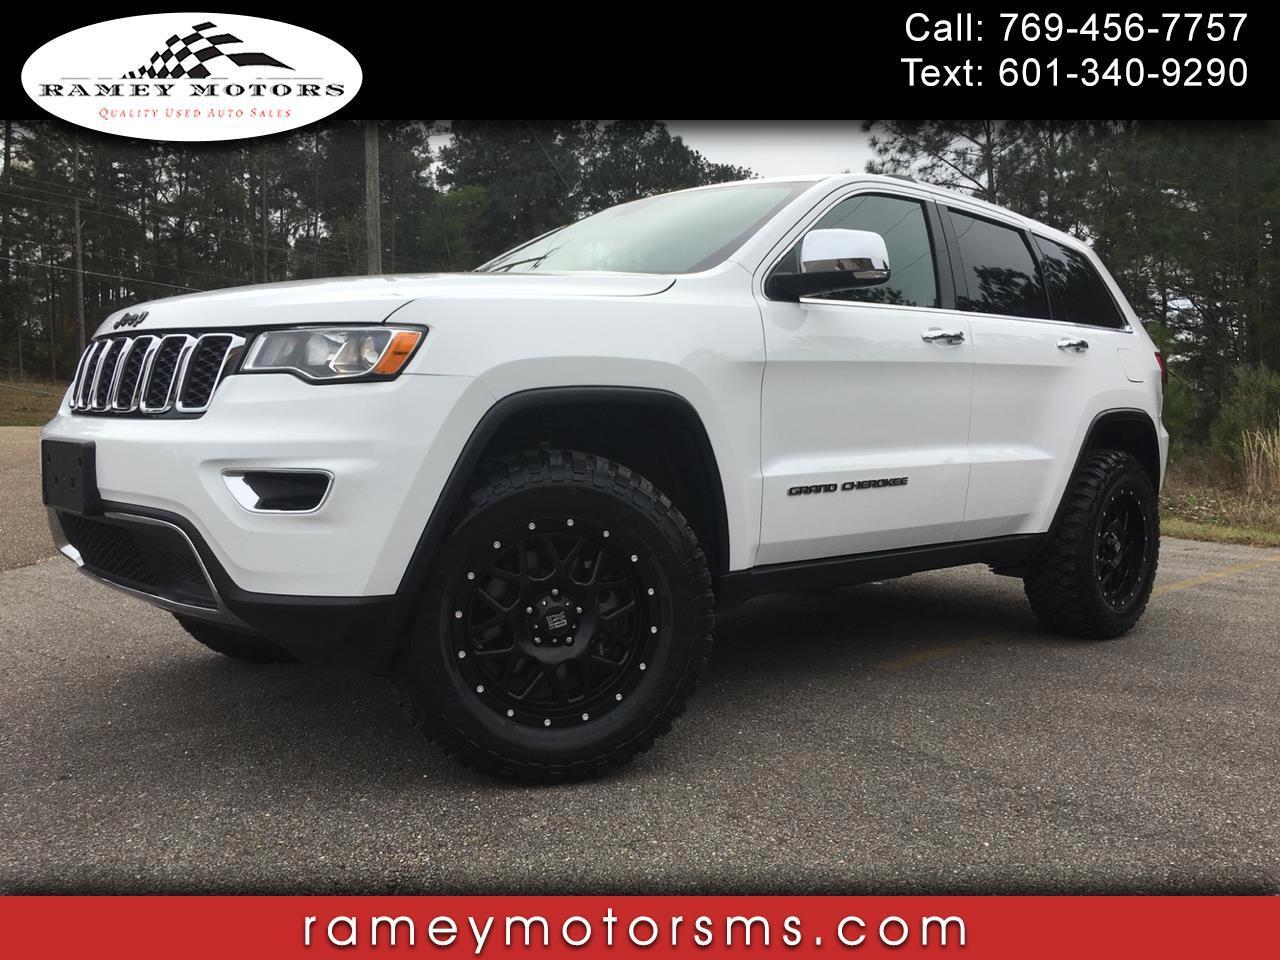 2018 Jeep Grand Cherokee 4WD CUSTOM LIFTED LIMITED